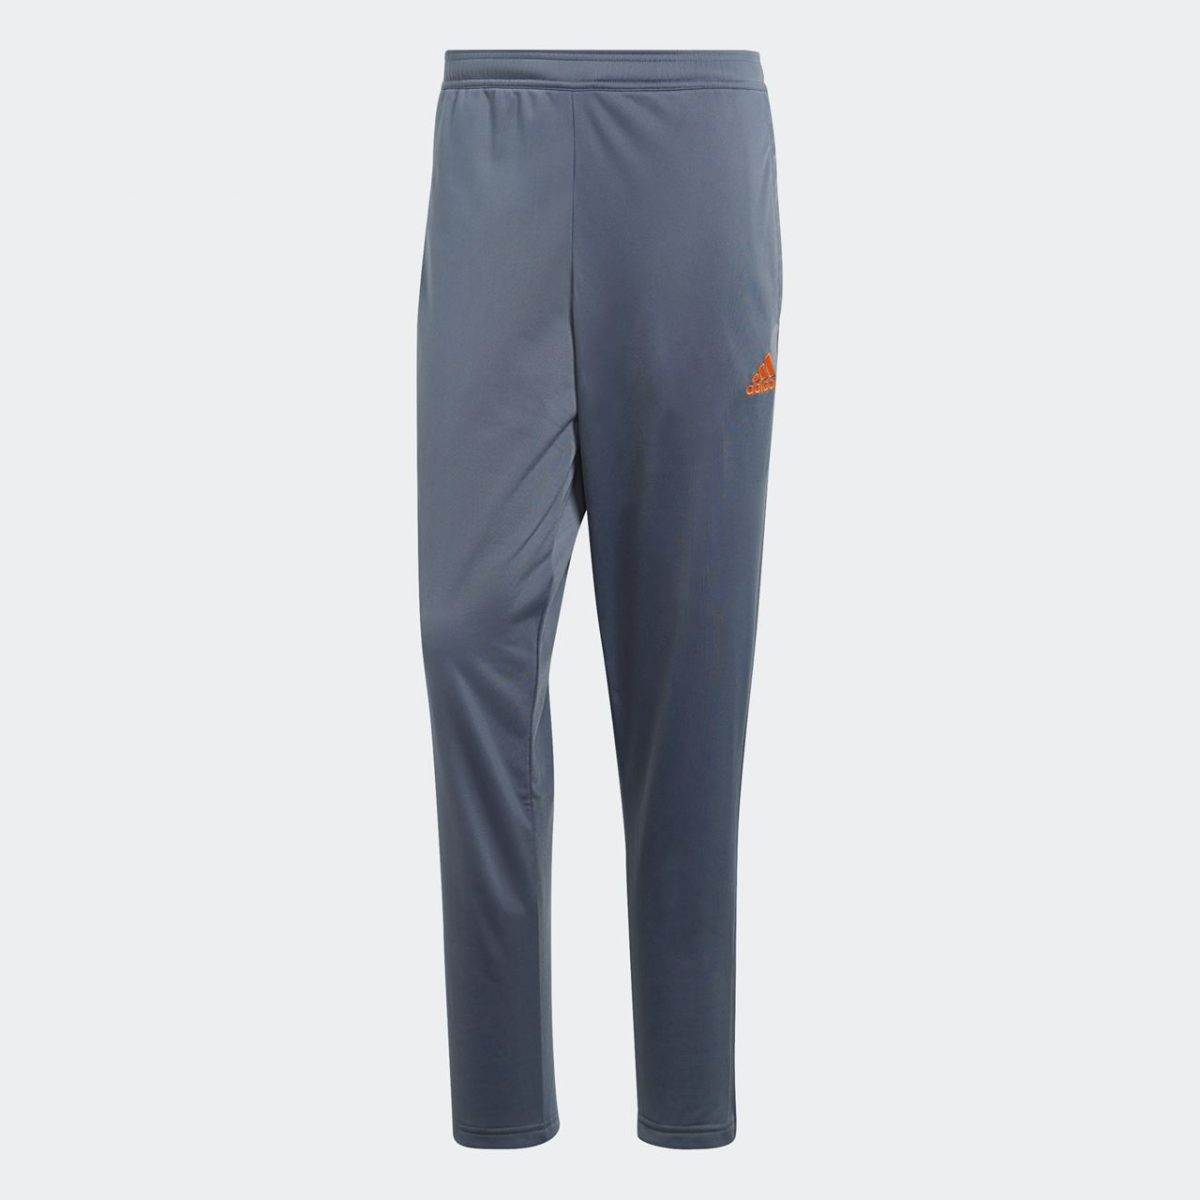 Adidas Condivo 18 PES Pant Junior